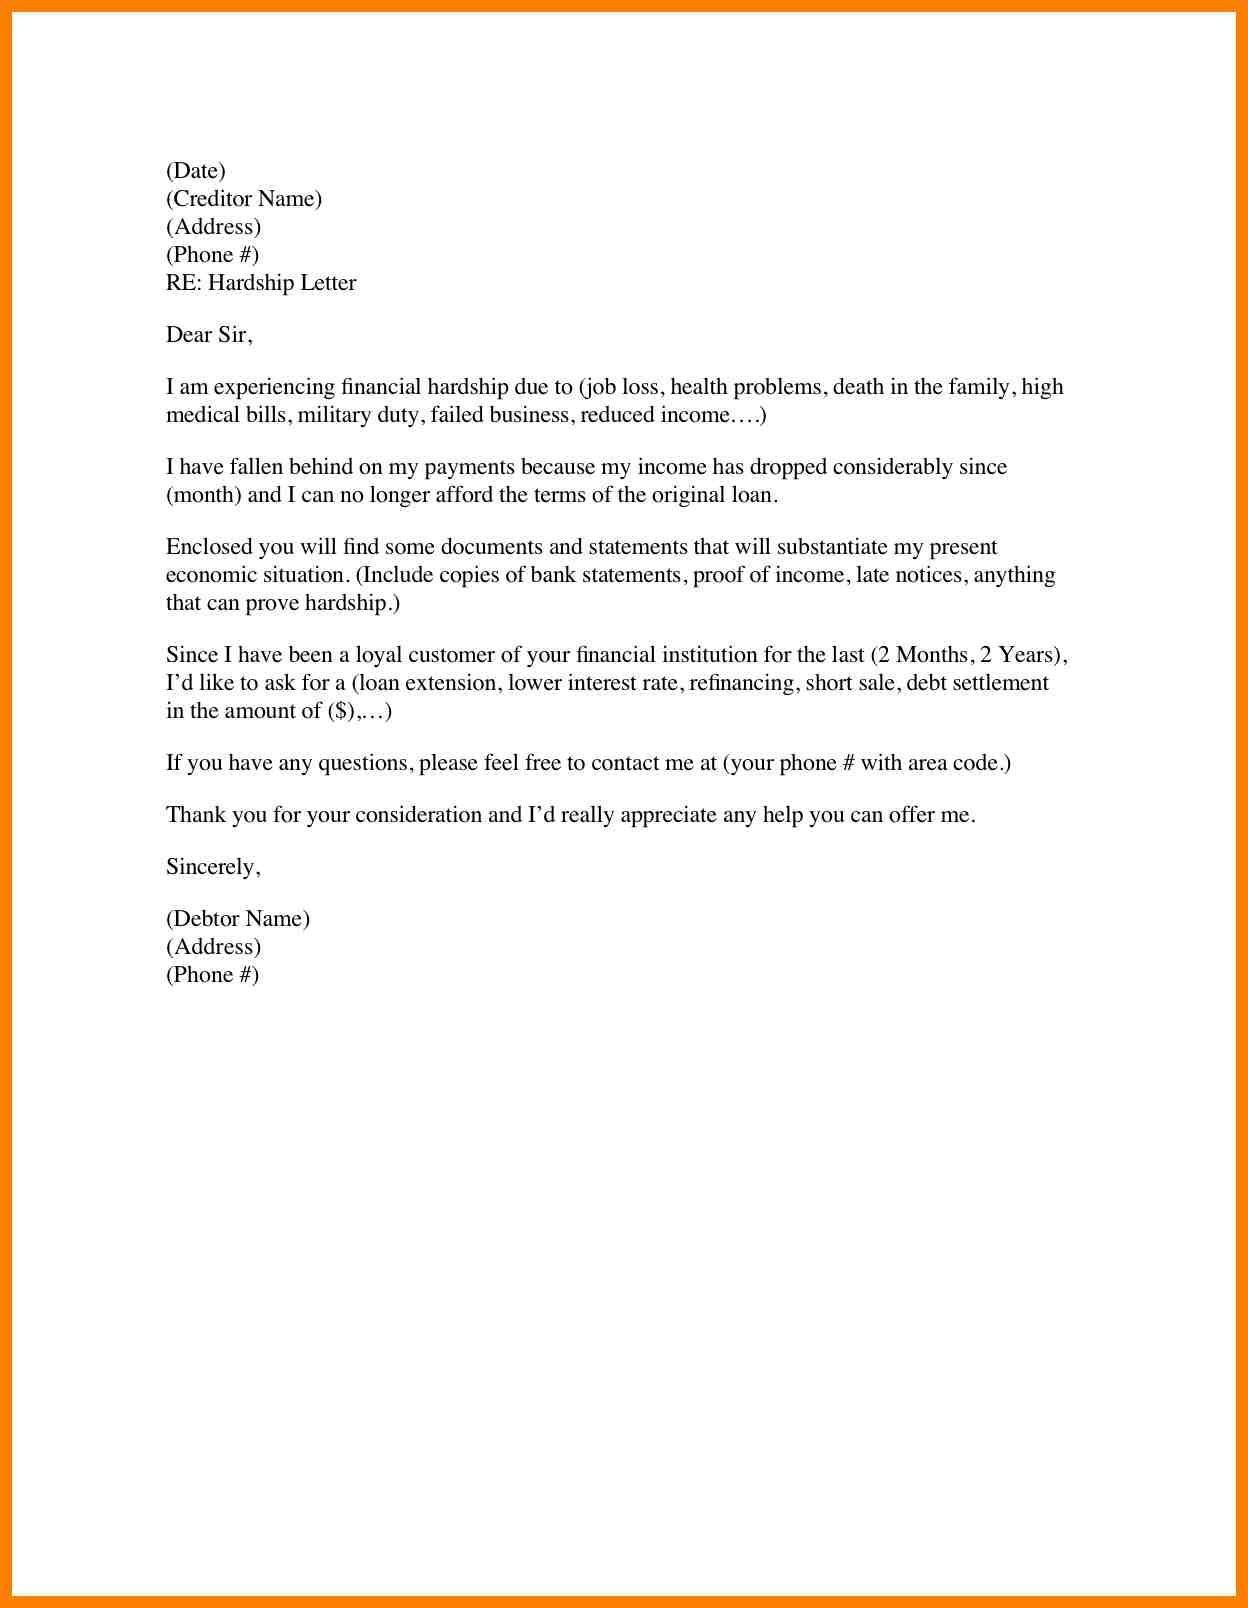 Short Sale Hardship Letter Template - Sample Business Thank You Letter Interview Best Sample Parole